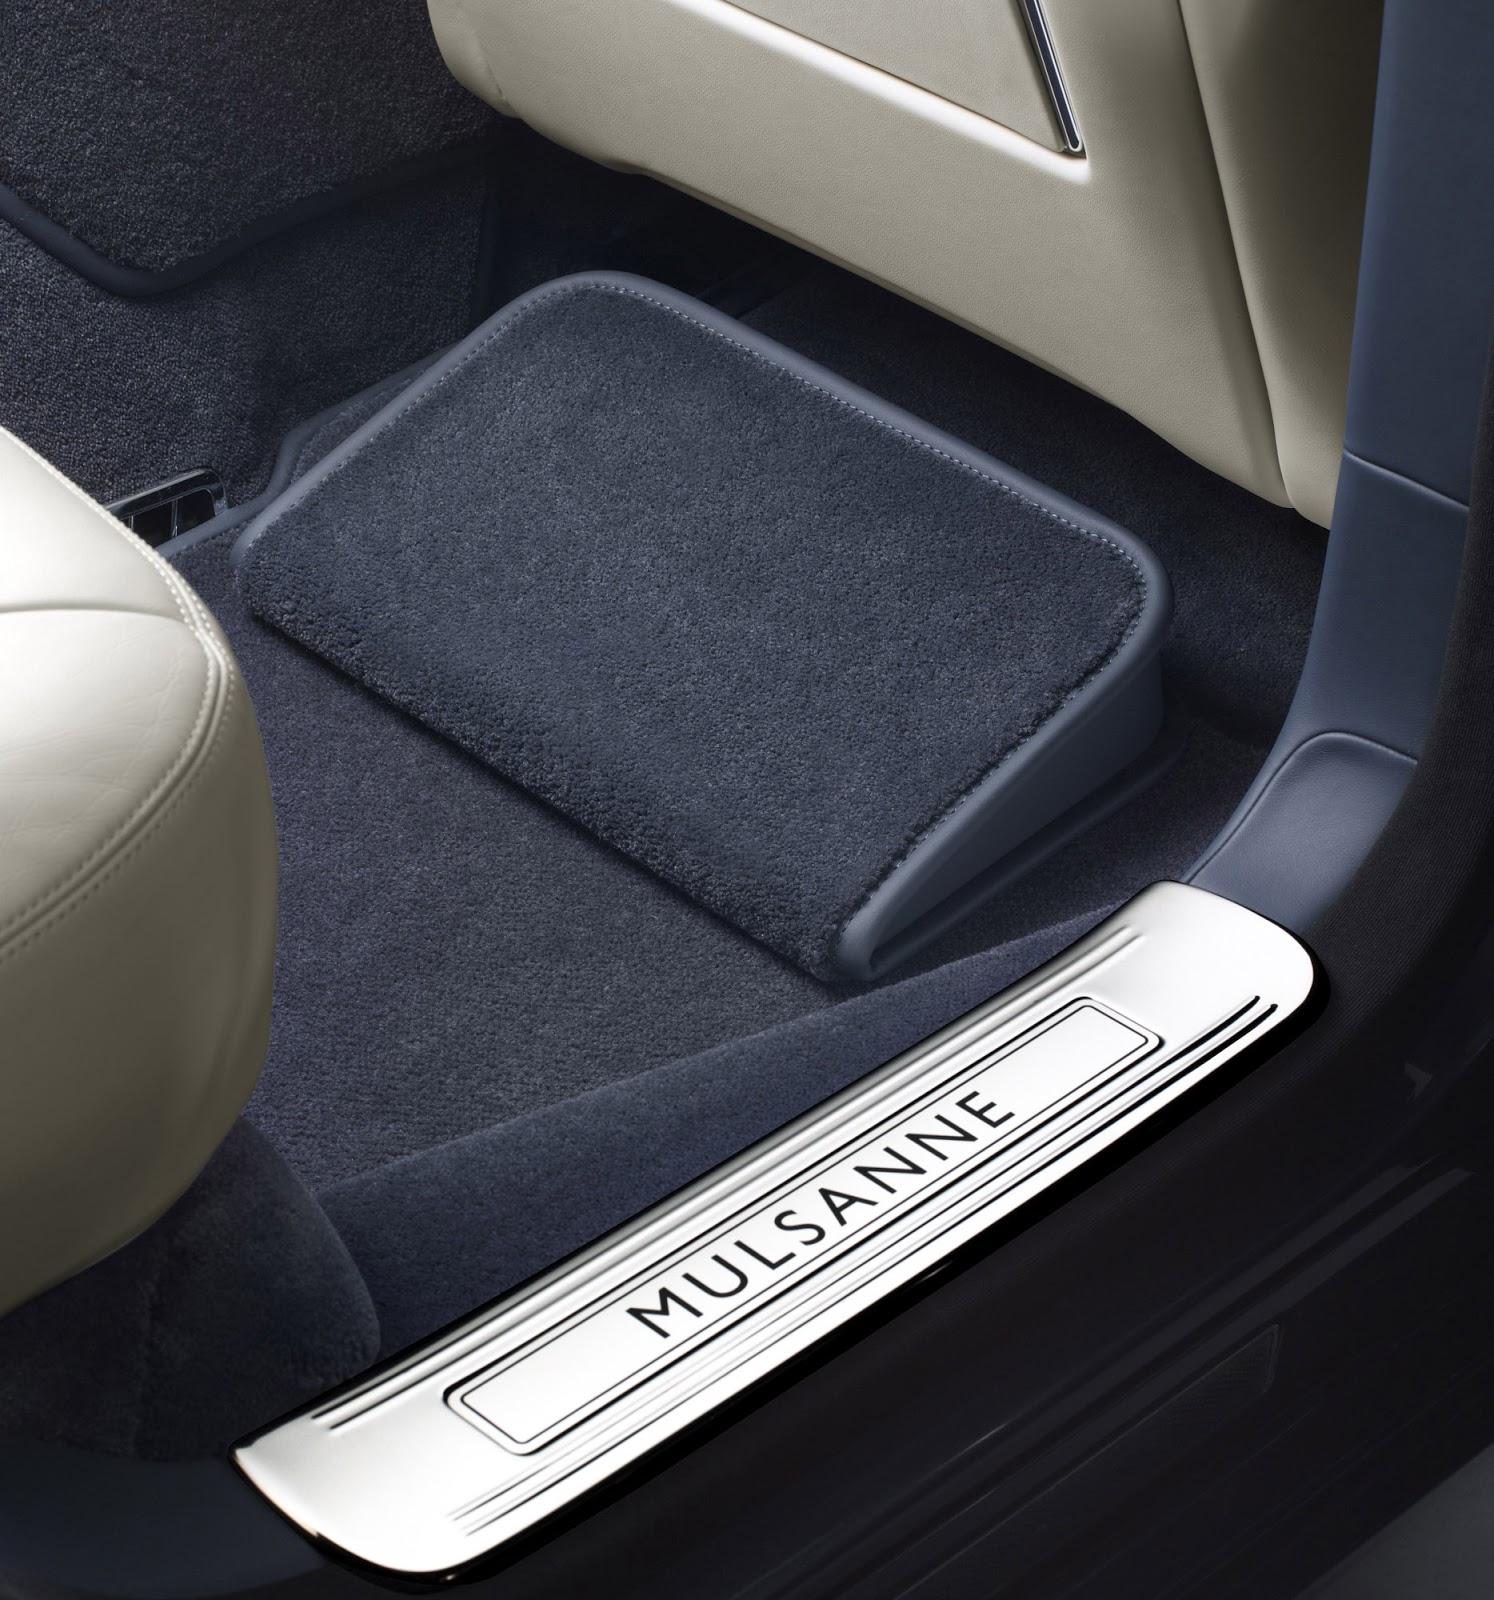 Bentley Mulsanne 2014 | 2014 Bentley Mulsanne | New Bentley Mulsanne | 2014 Bentley Mulsanne Specs | 2014 Bentley Mulsanne Price